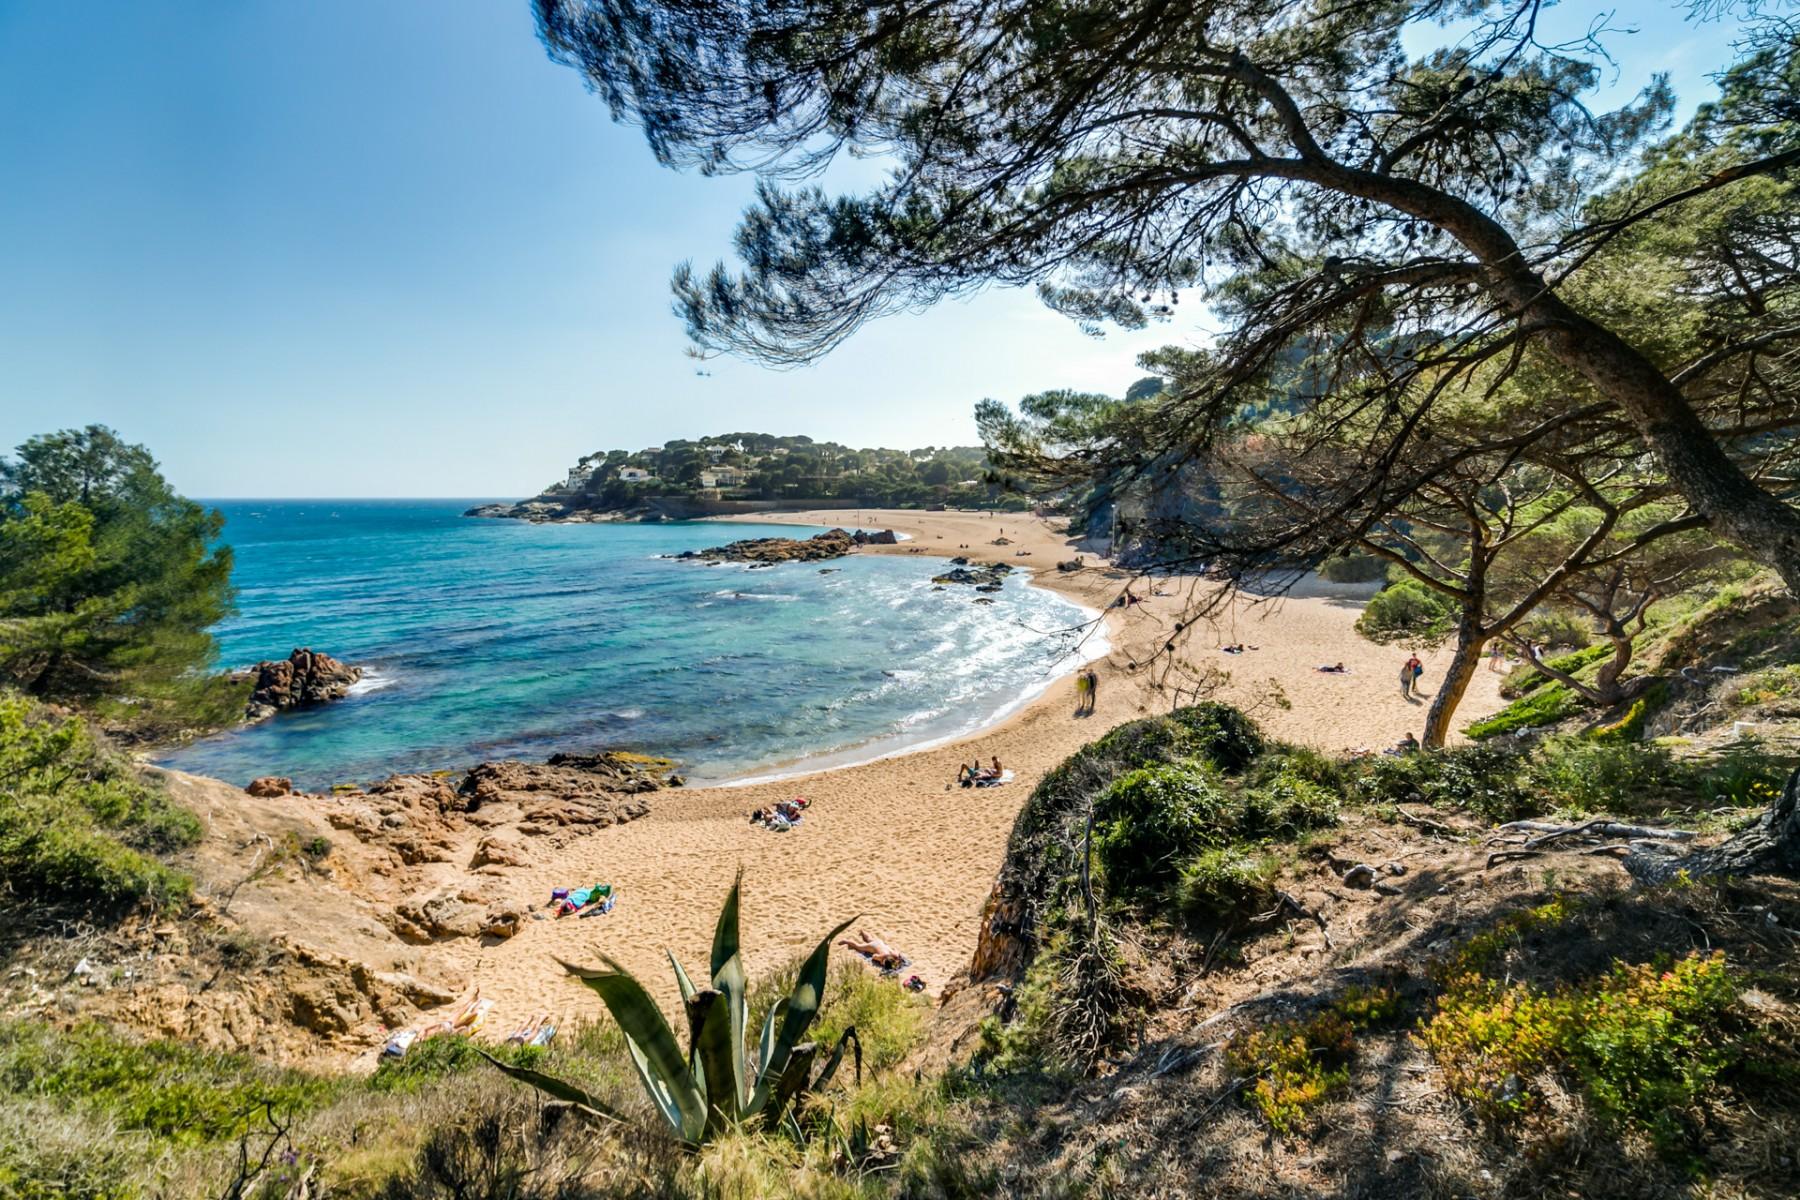 Apartamentos en platja d aro vivalidays sa conca platja d 39 aro - Pisos alquiler platja d aro ...